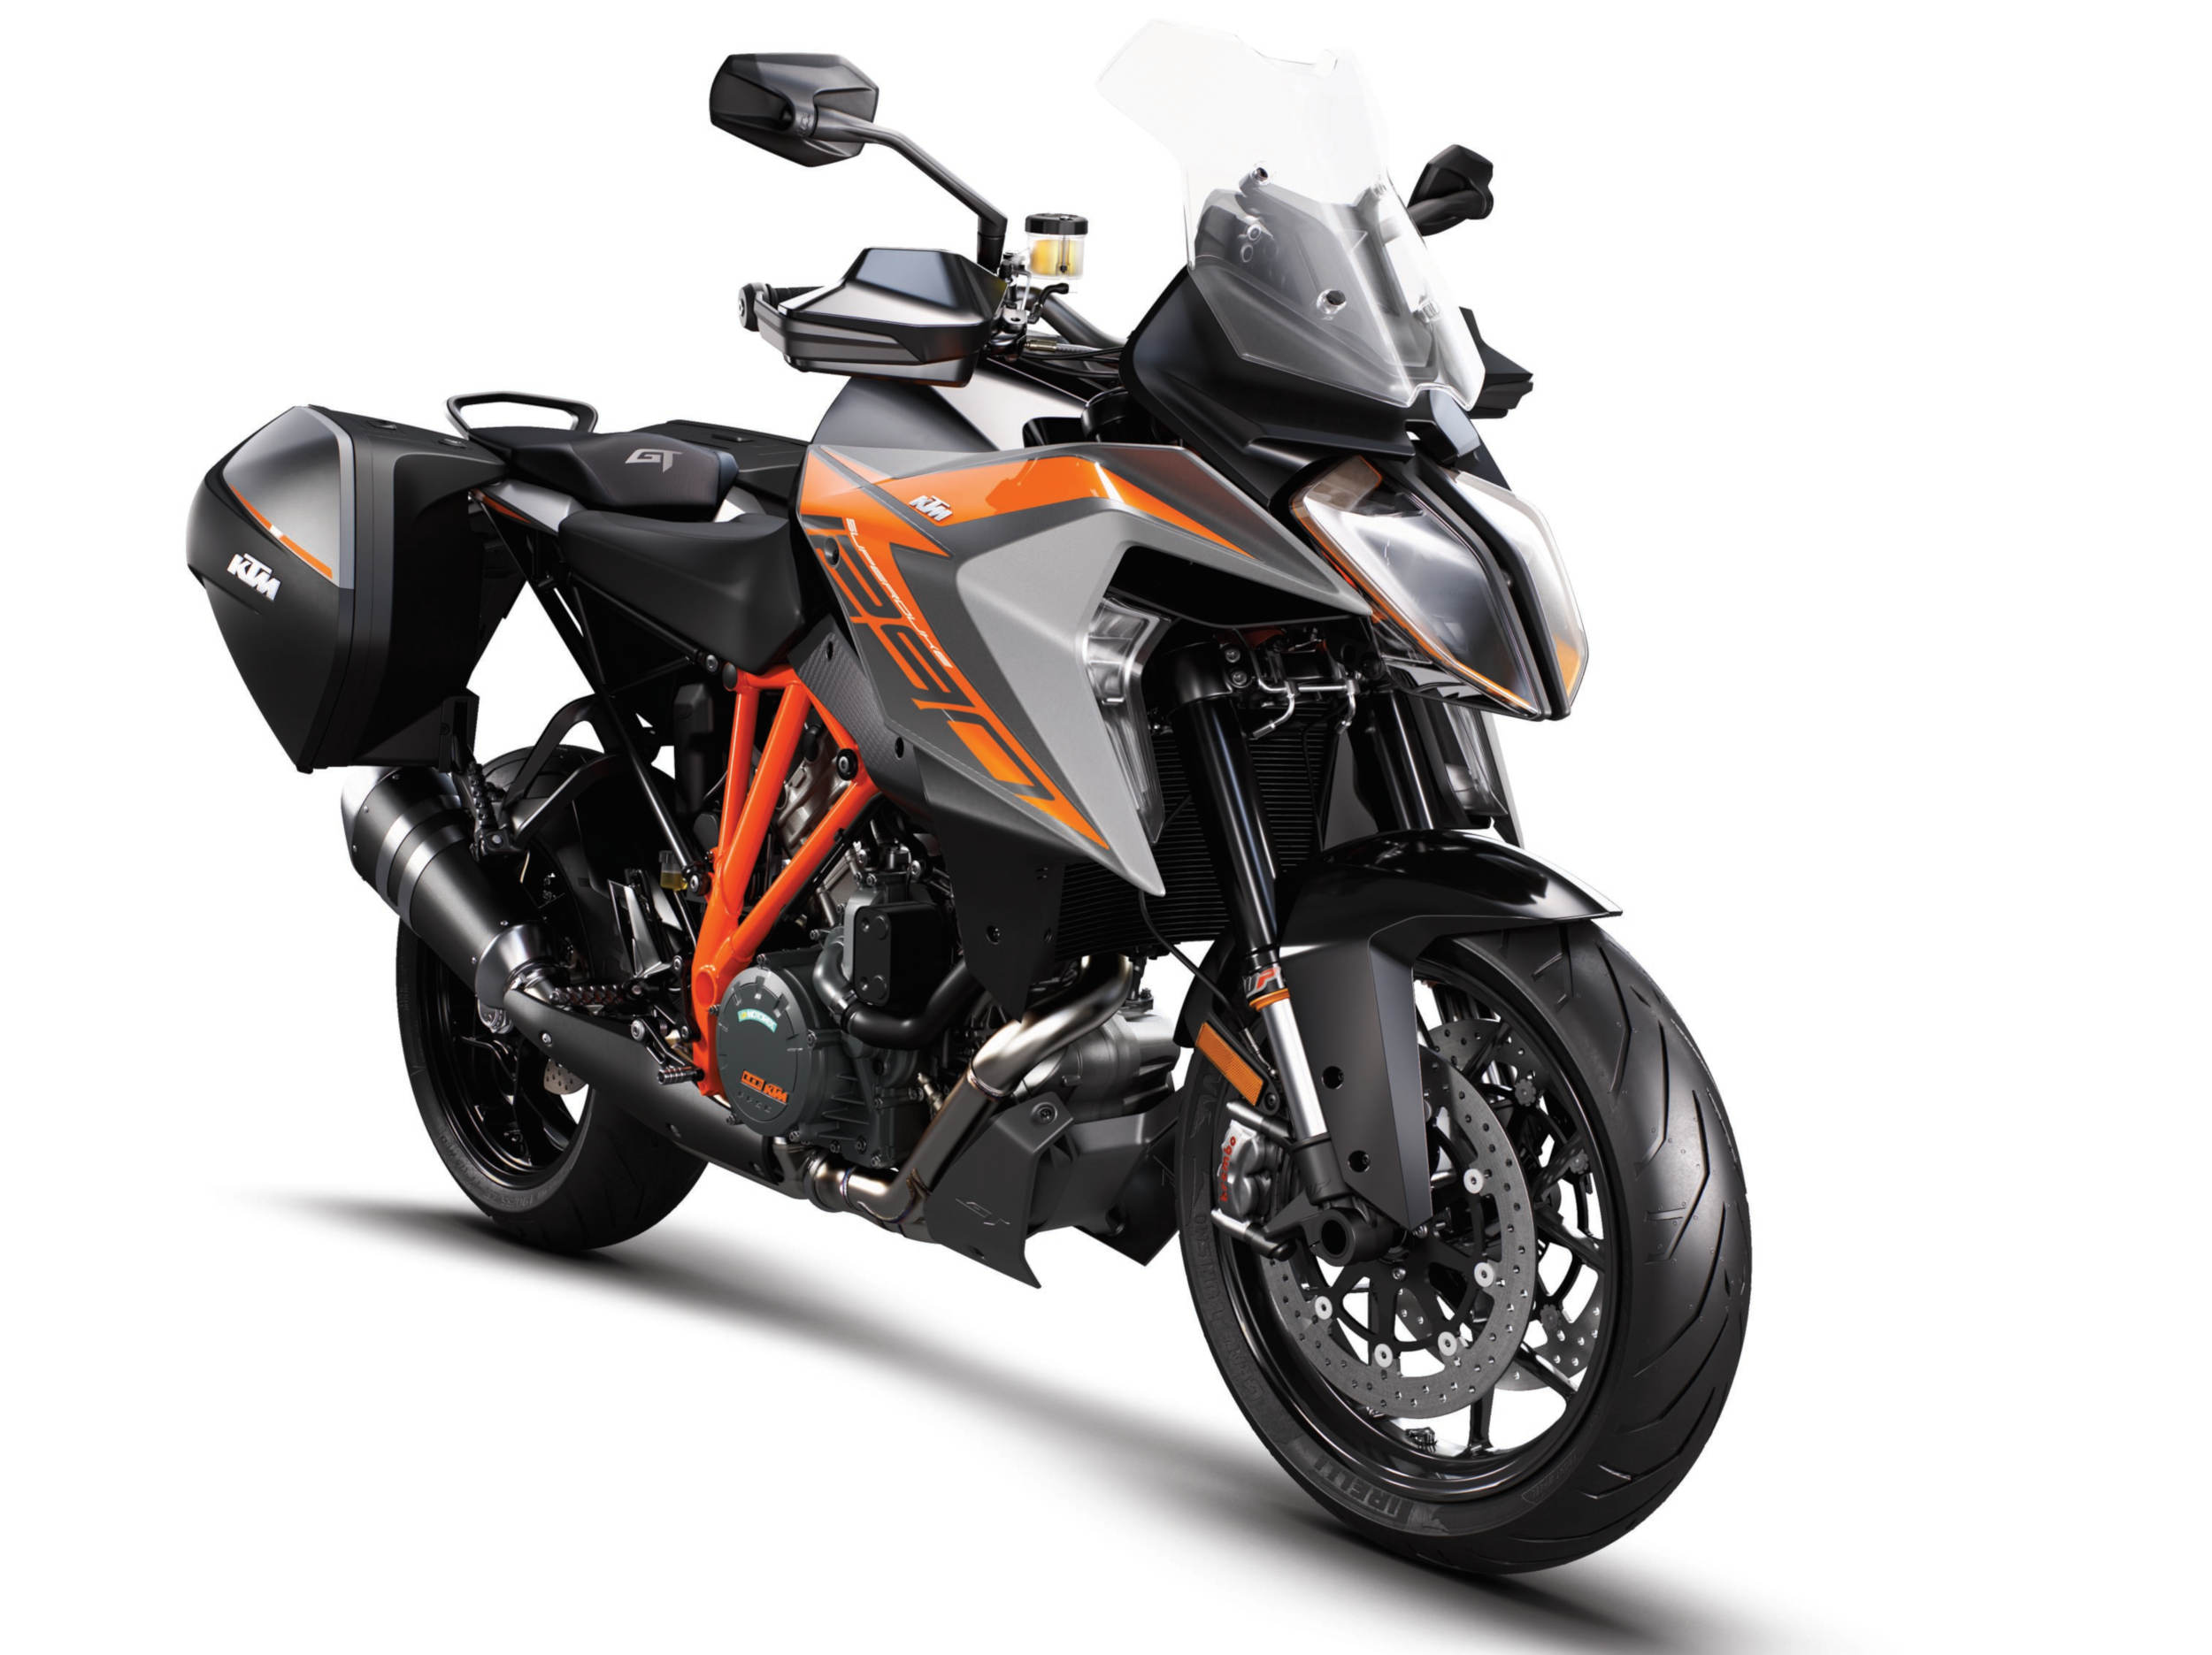 ktm makes significant changes to 2019 1290 super duke gt motorcycle news. Black Bedroom Furniture Sets. Home Design Ideas